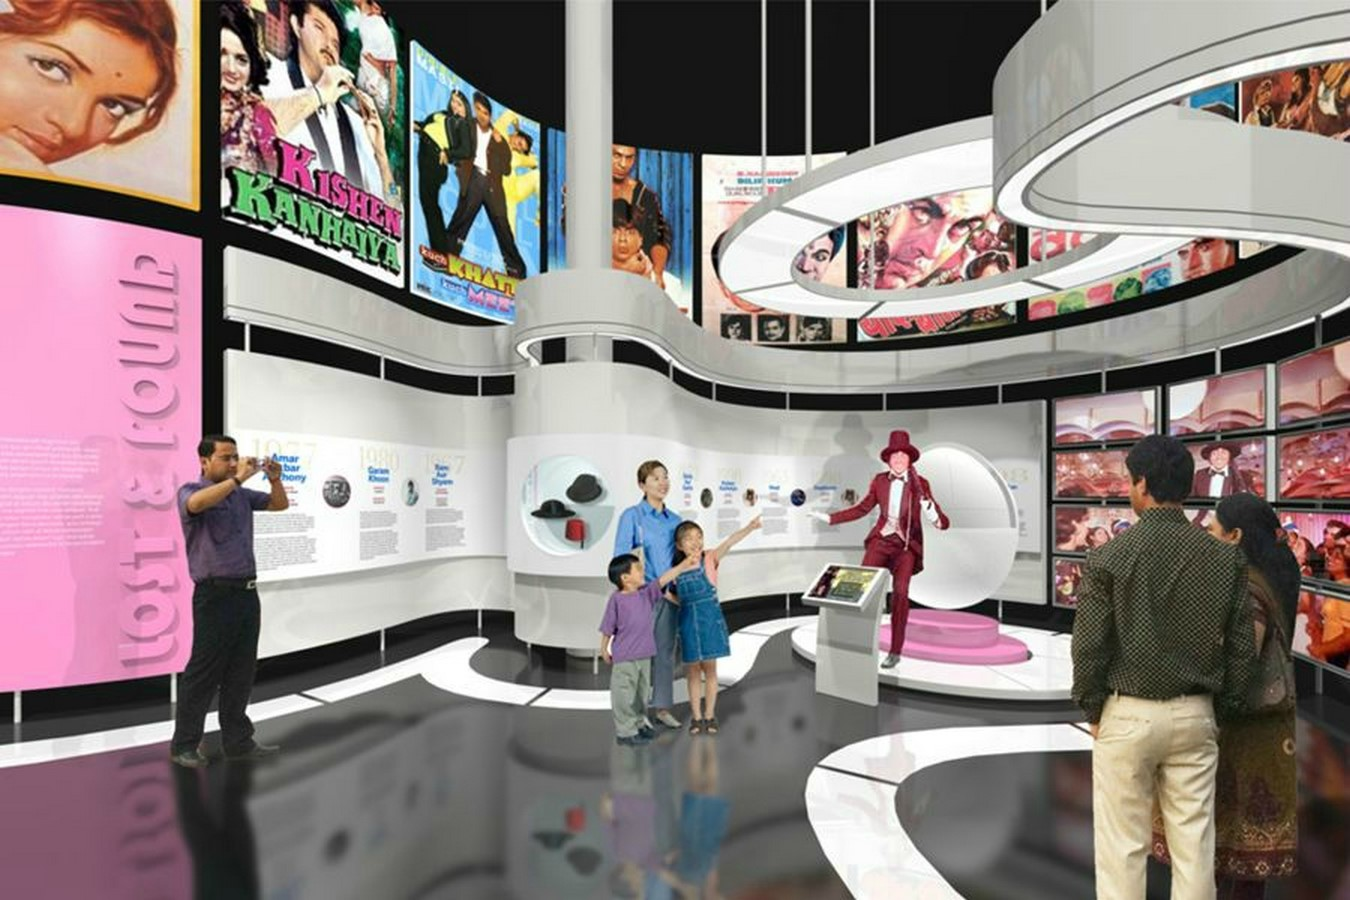 Bollywood Museum by Shashi Prabhu: A Star-Studded Museum Sheet9